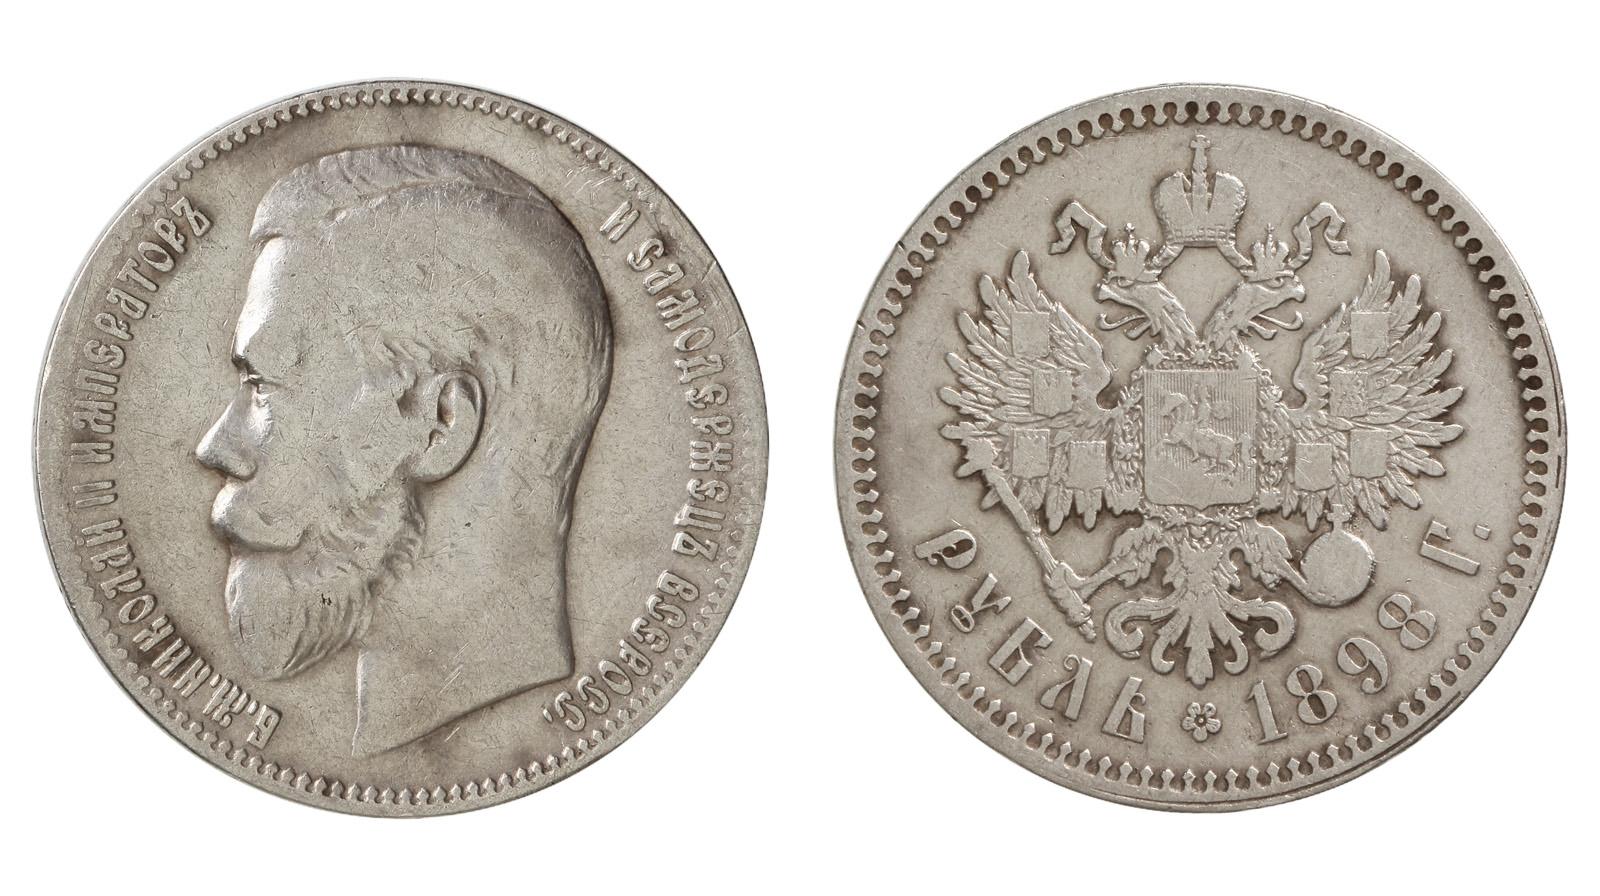 1лат 1924г цена